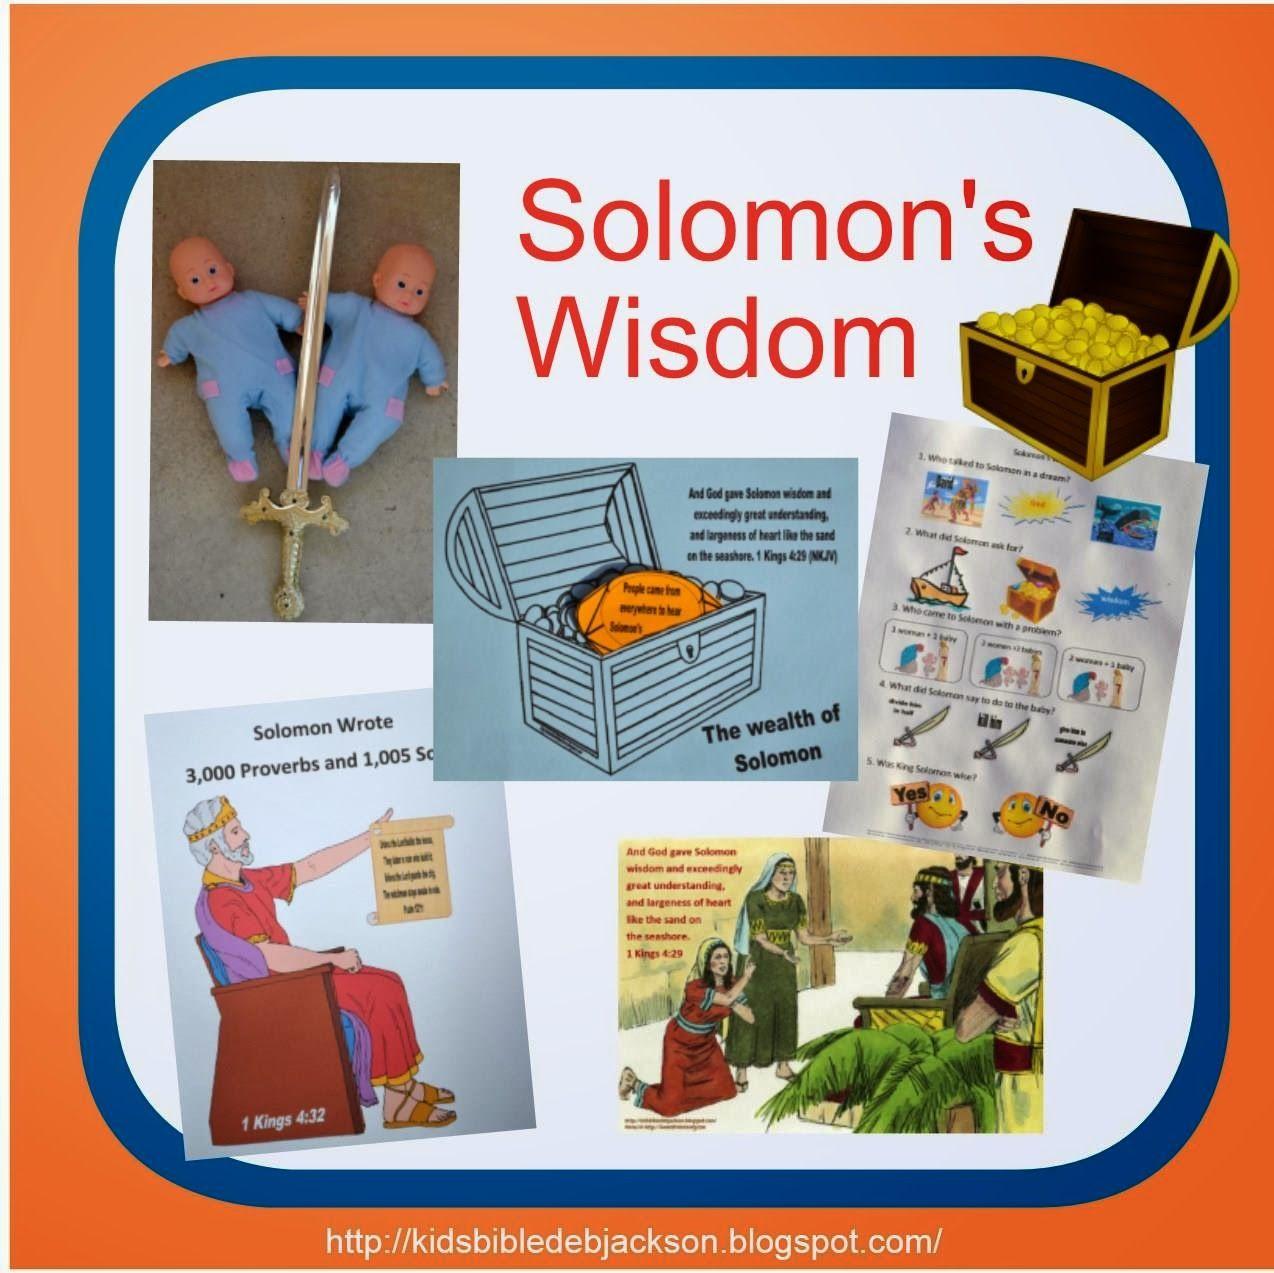 http kidsbibledebjackson blogspot com 2014 02 solomons wisdom